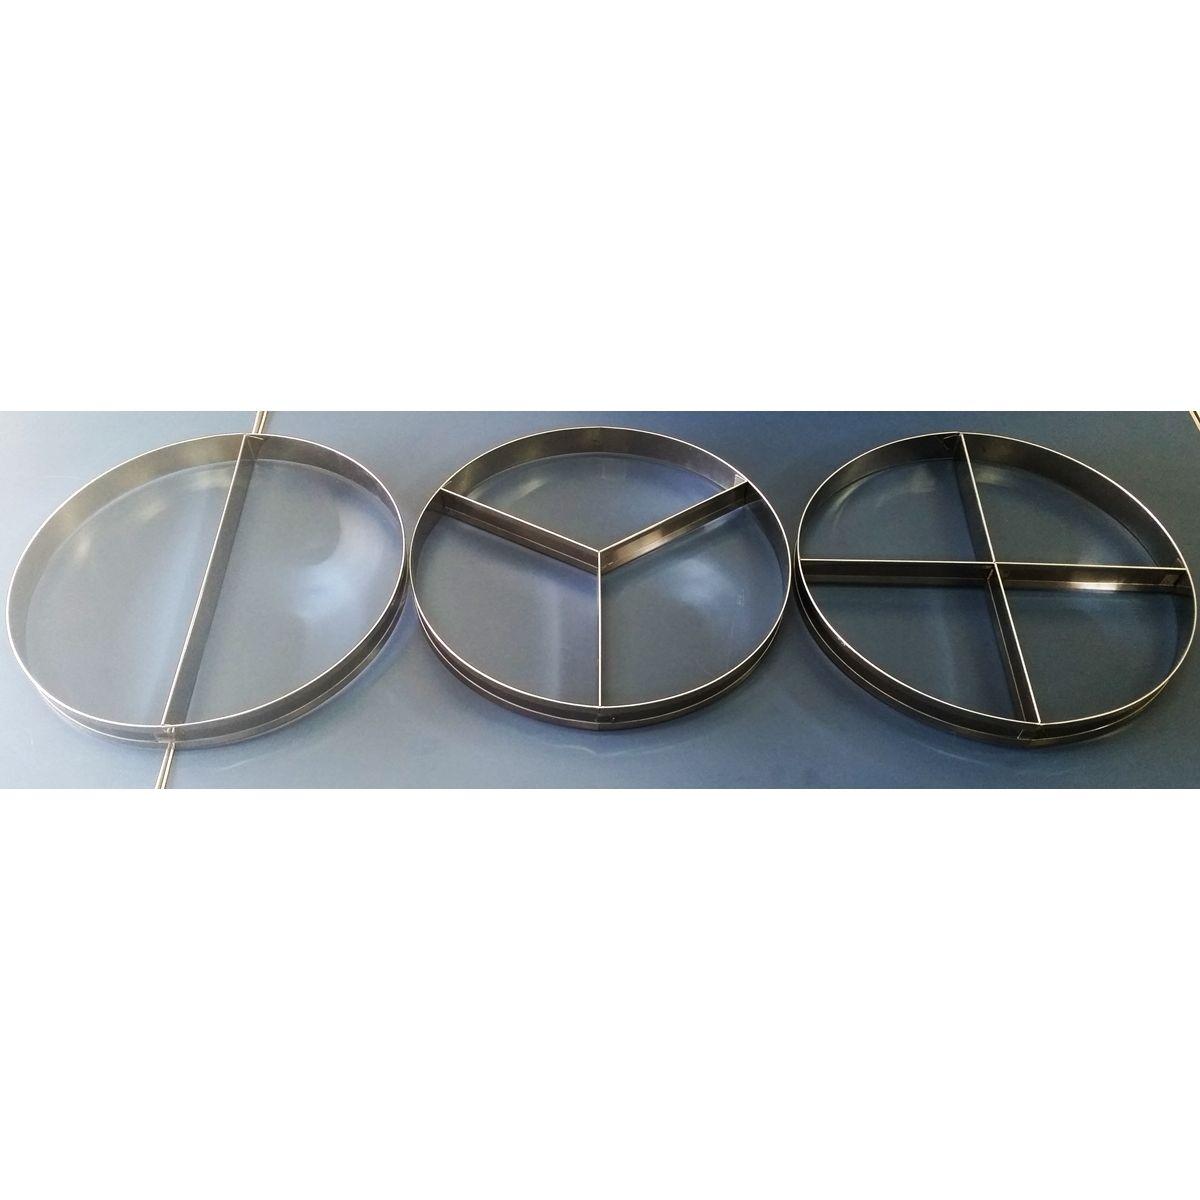 APARTADORES - 2, 3 e 4 SABORES INOX. P/PIZZAS DE 30 CM  - Fórum de Pizzas Vendas online